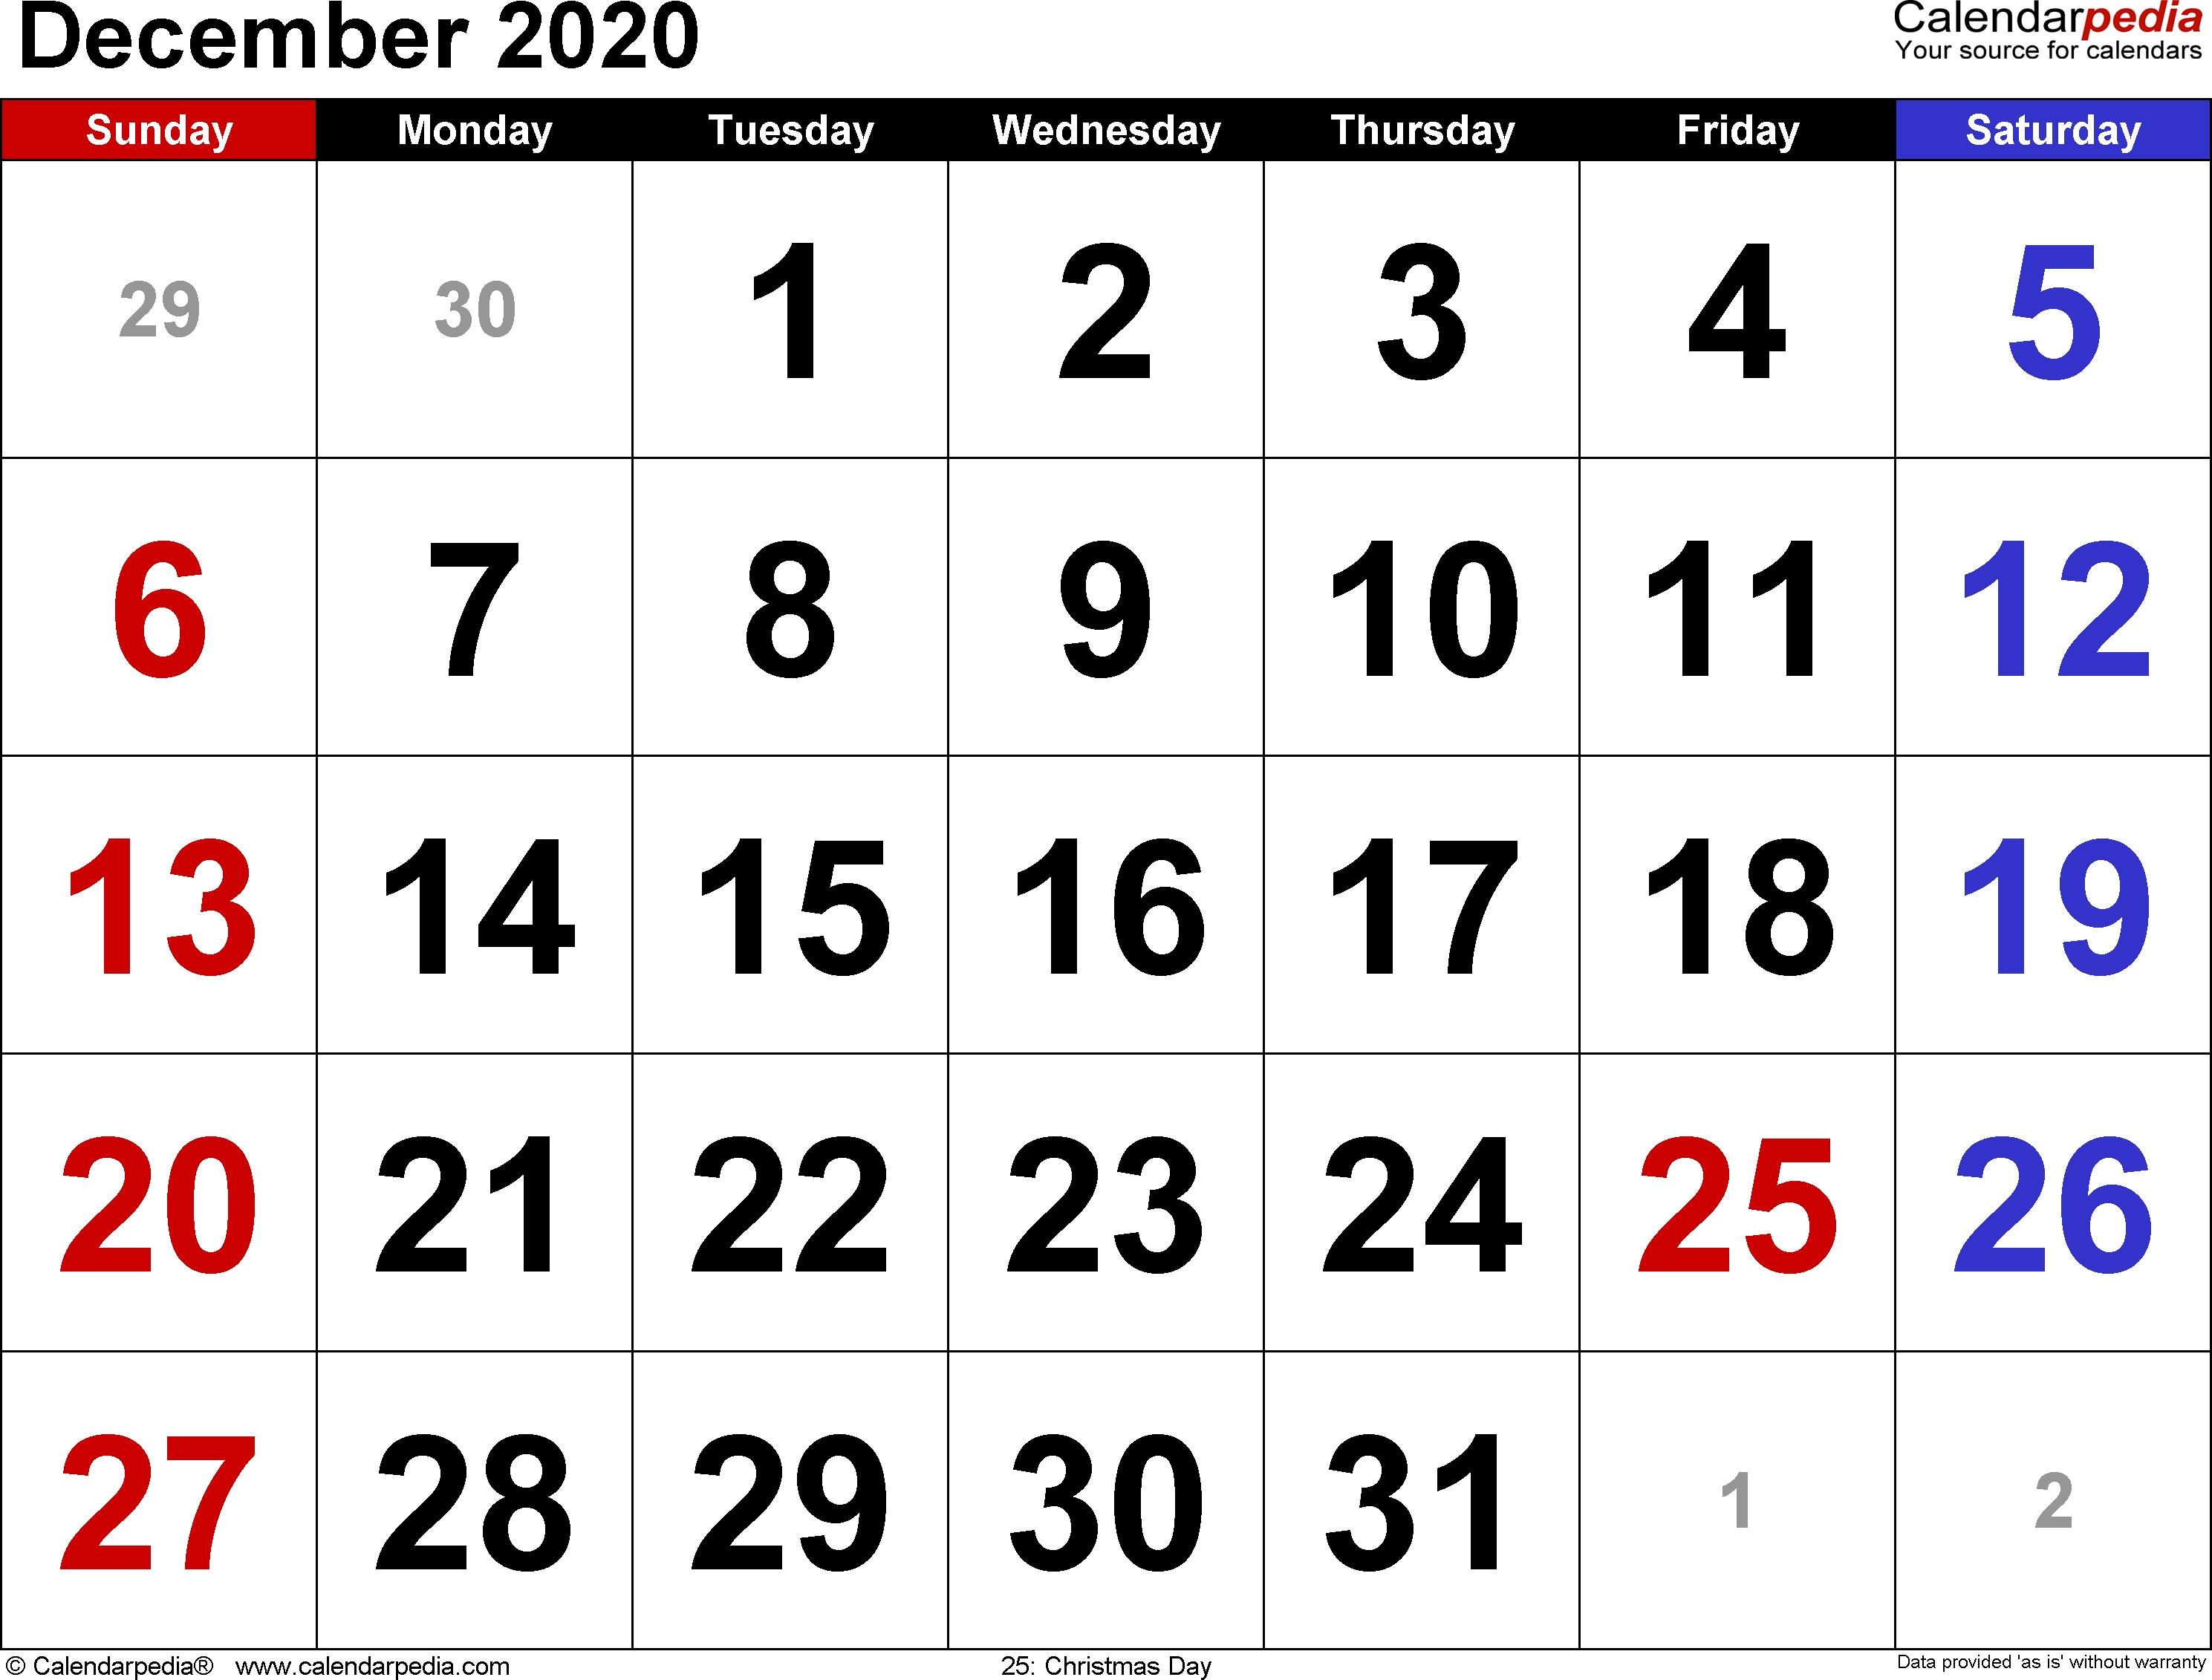 December 2020 Calendars For Word, Excel & Pdf  August To December 2020 Calendar